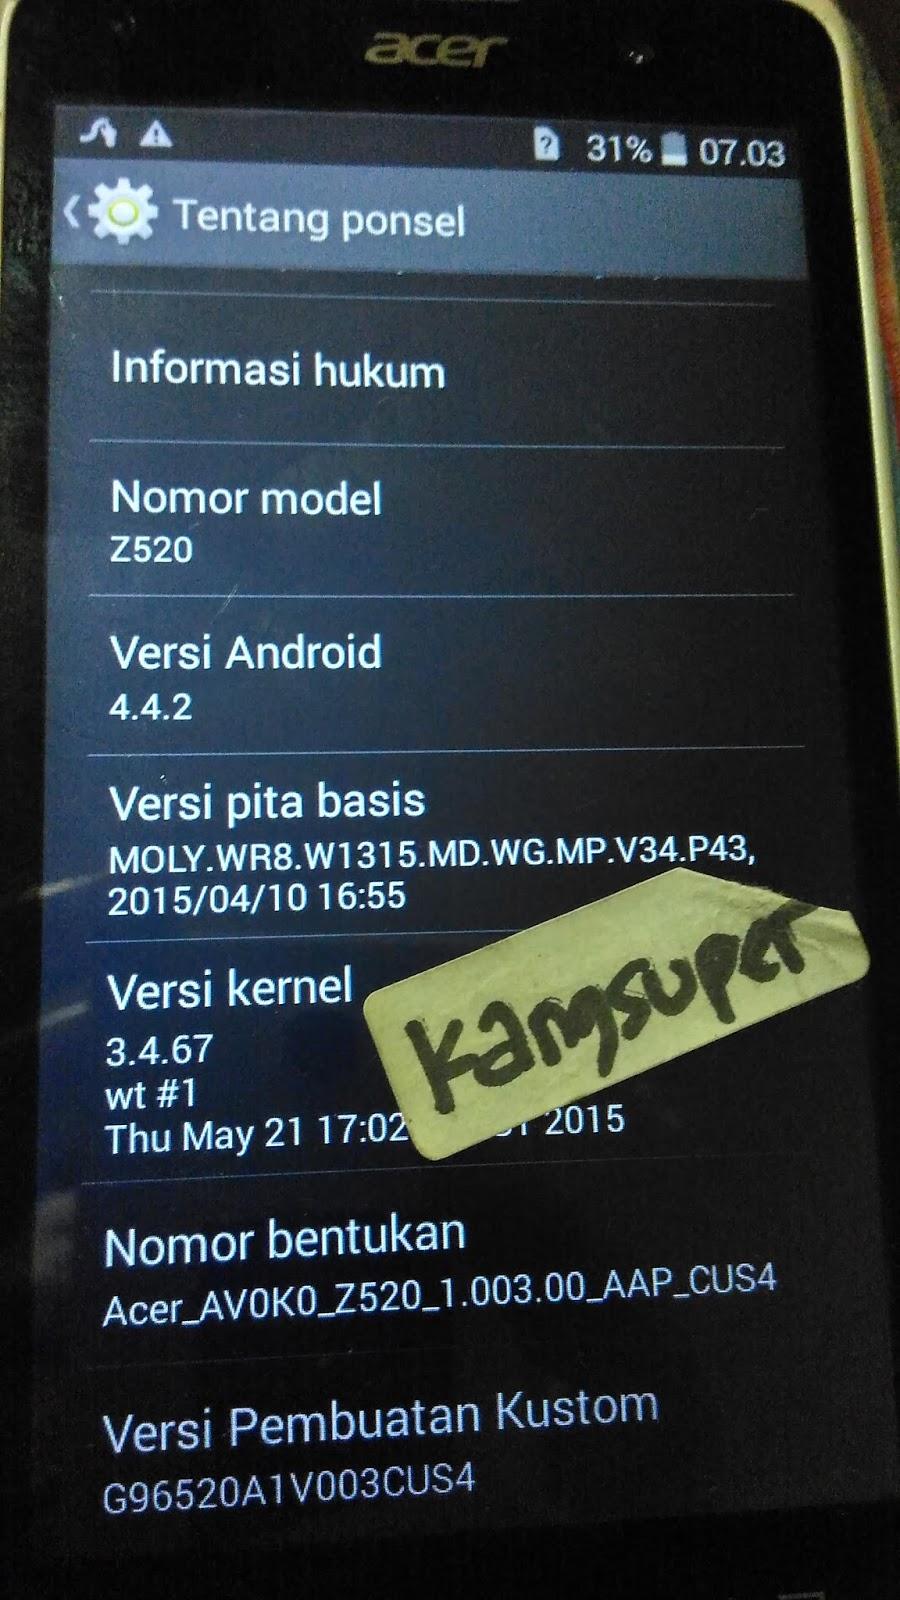 Firmware Acer Z200 Dual Sim Bahasa Indonesia : firmware, bahasa, indonesia, Firmware, Liquid, Bahasa, Indonesia, Engry, Charging, Error, Total, Motorola, Blade, Install, Google, Store, Xiaomi